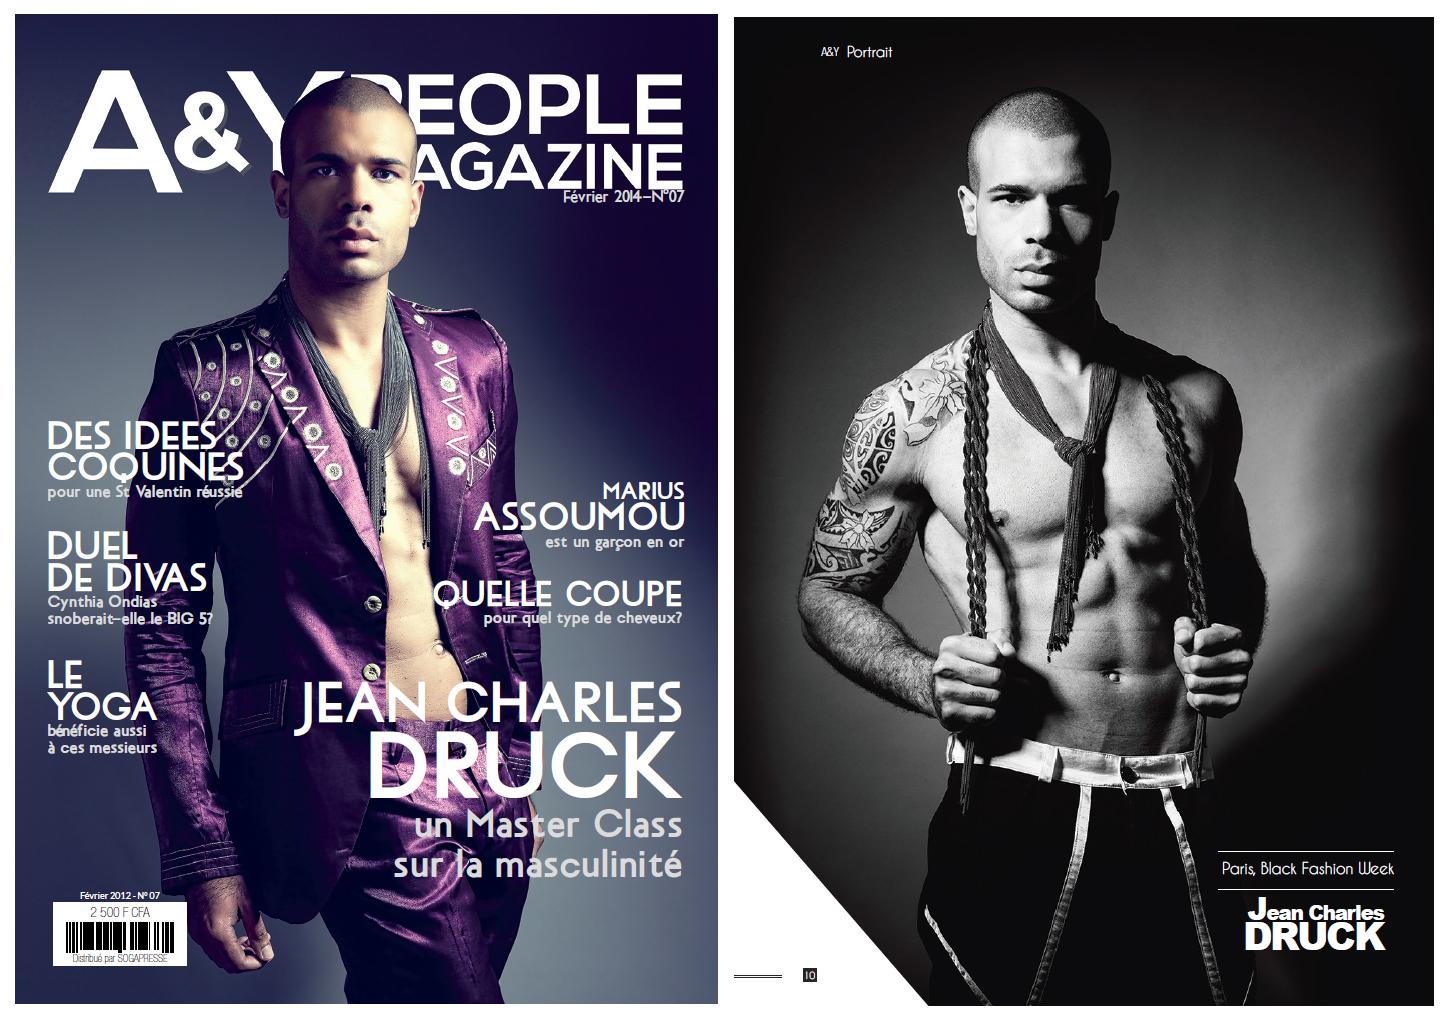 parution jC druck AY people magazine